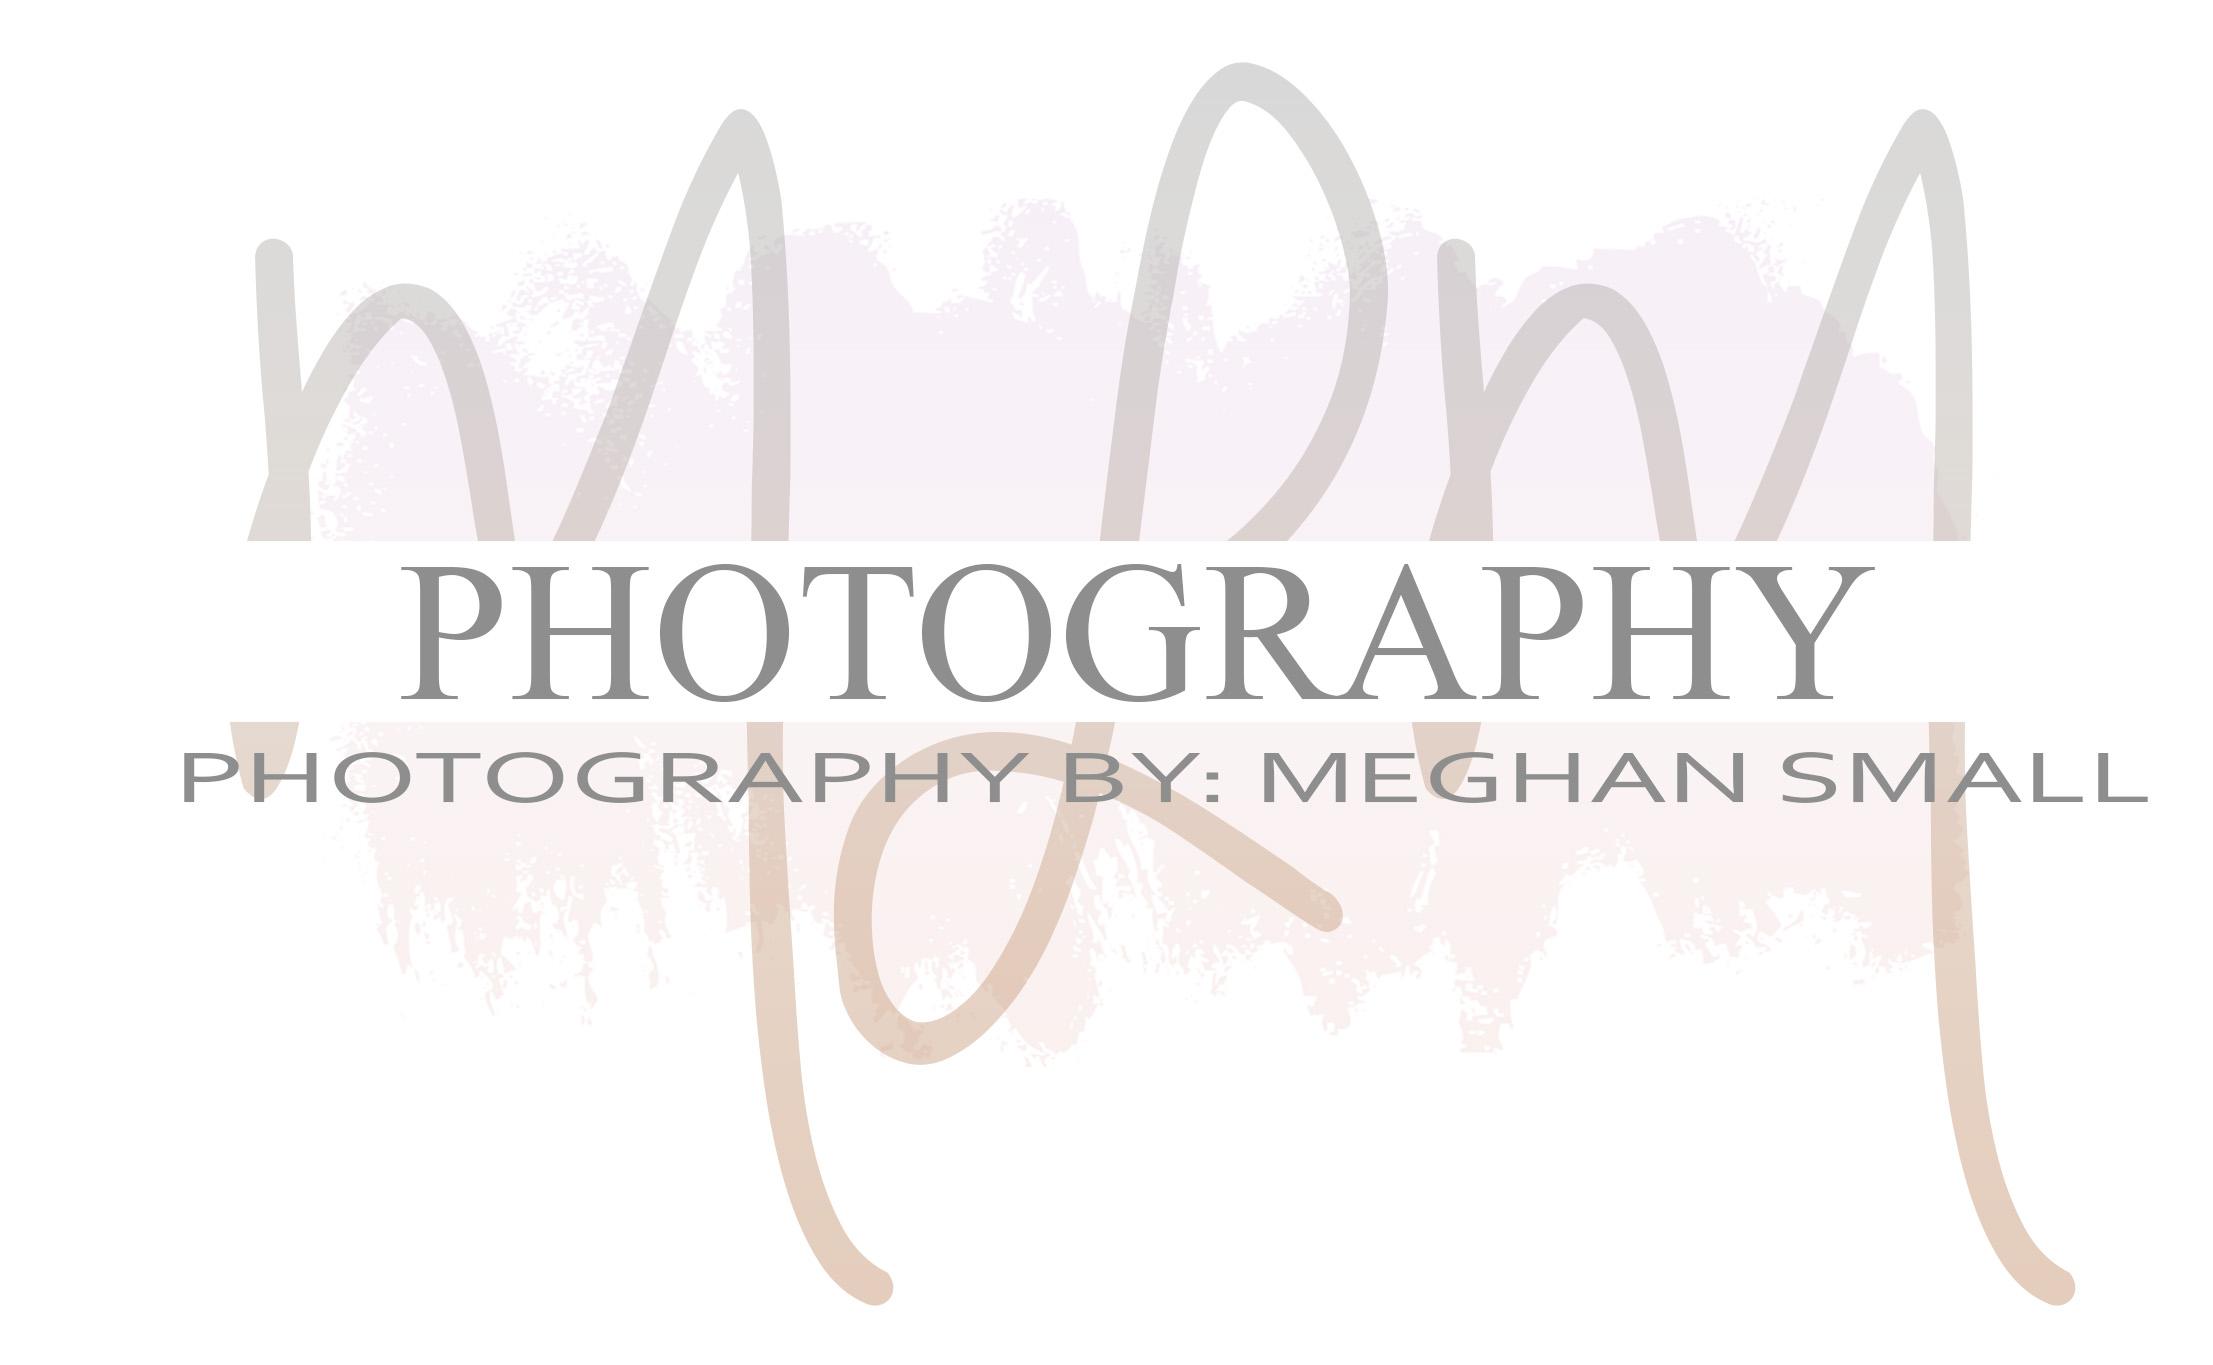 MLM PHOTOGRAPHY